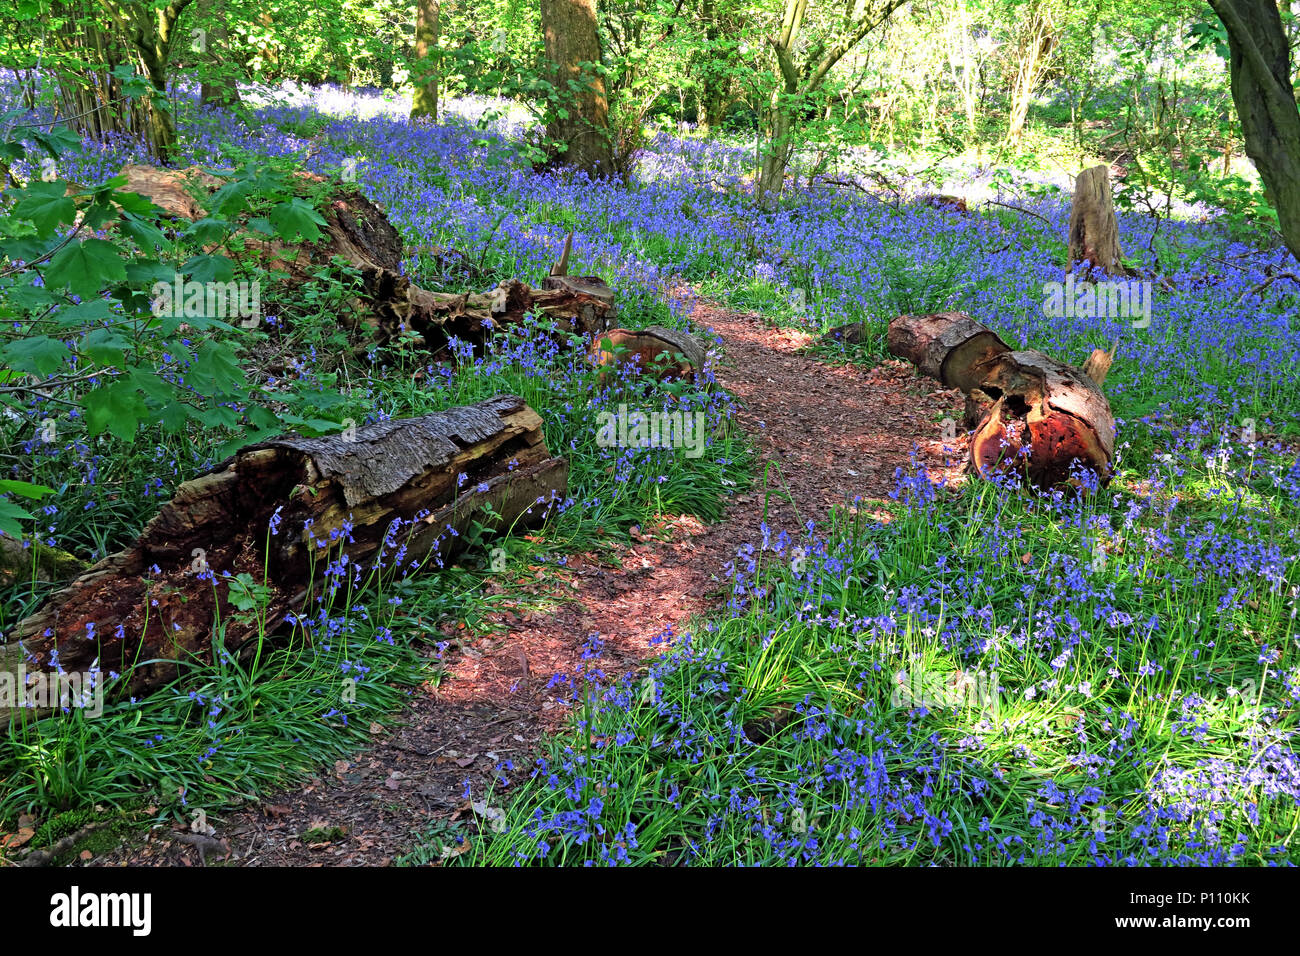 English Bluebell Wood in spring, Cheshire, England, UK Stock Photo